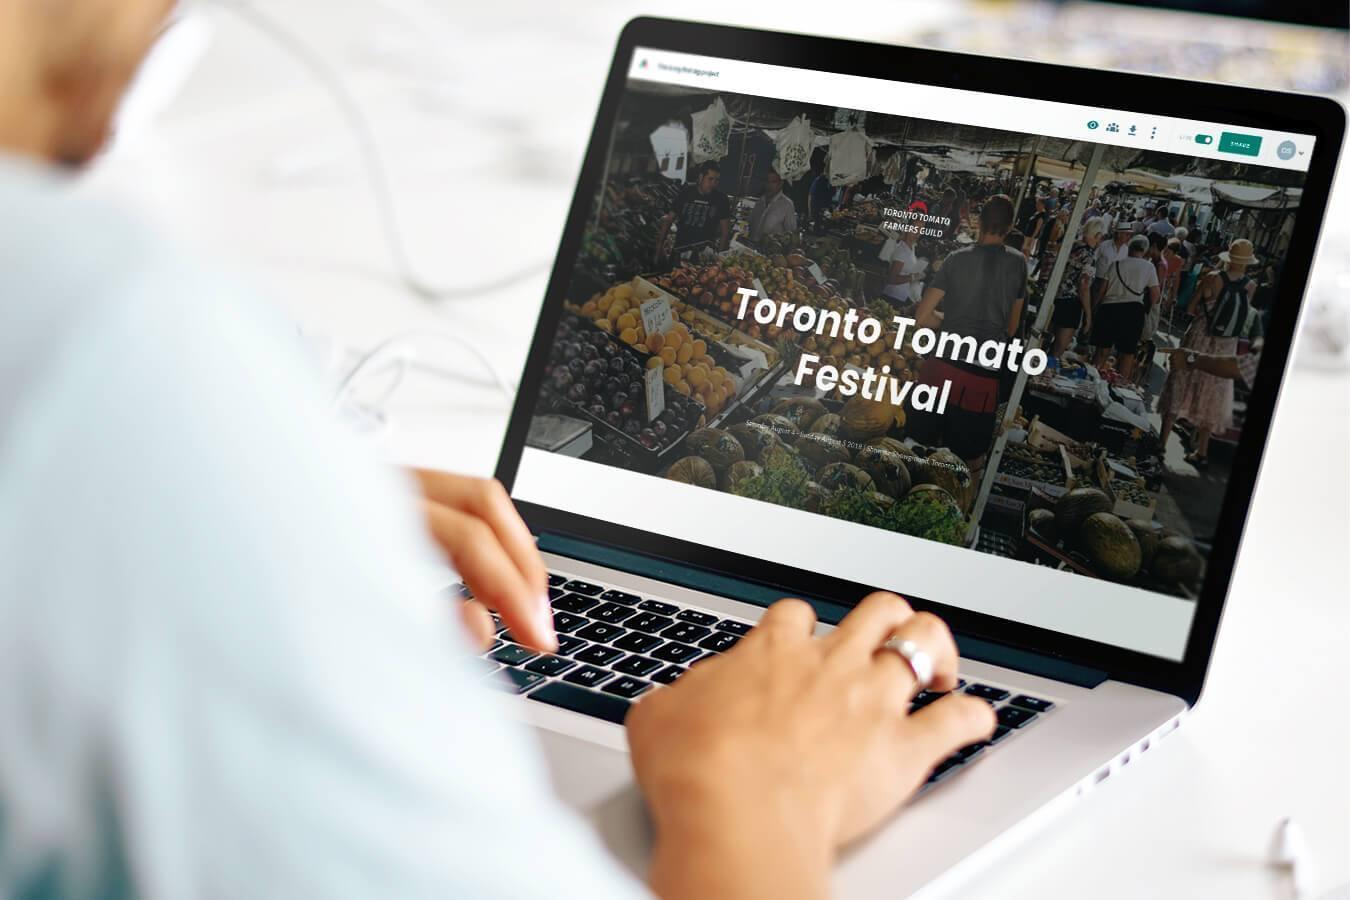 laptop-event-information